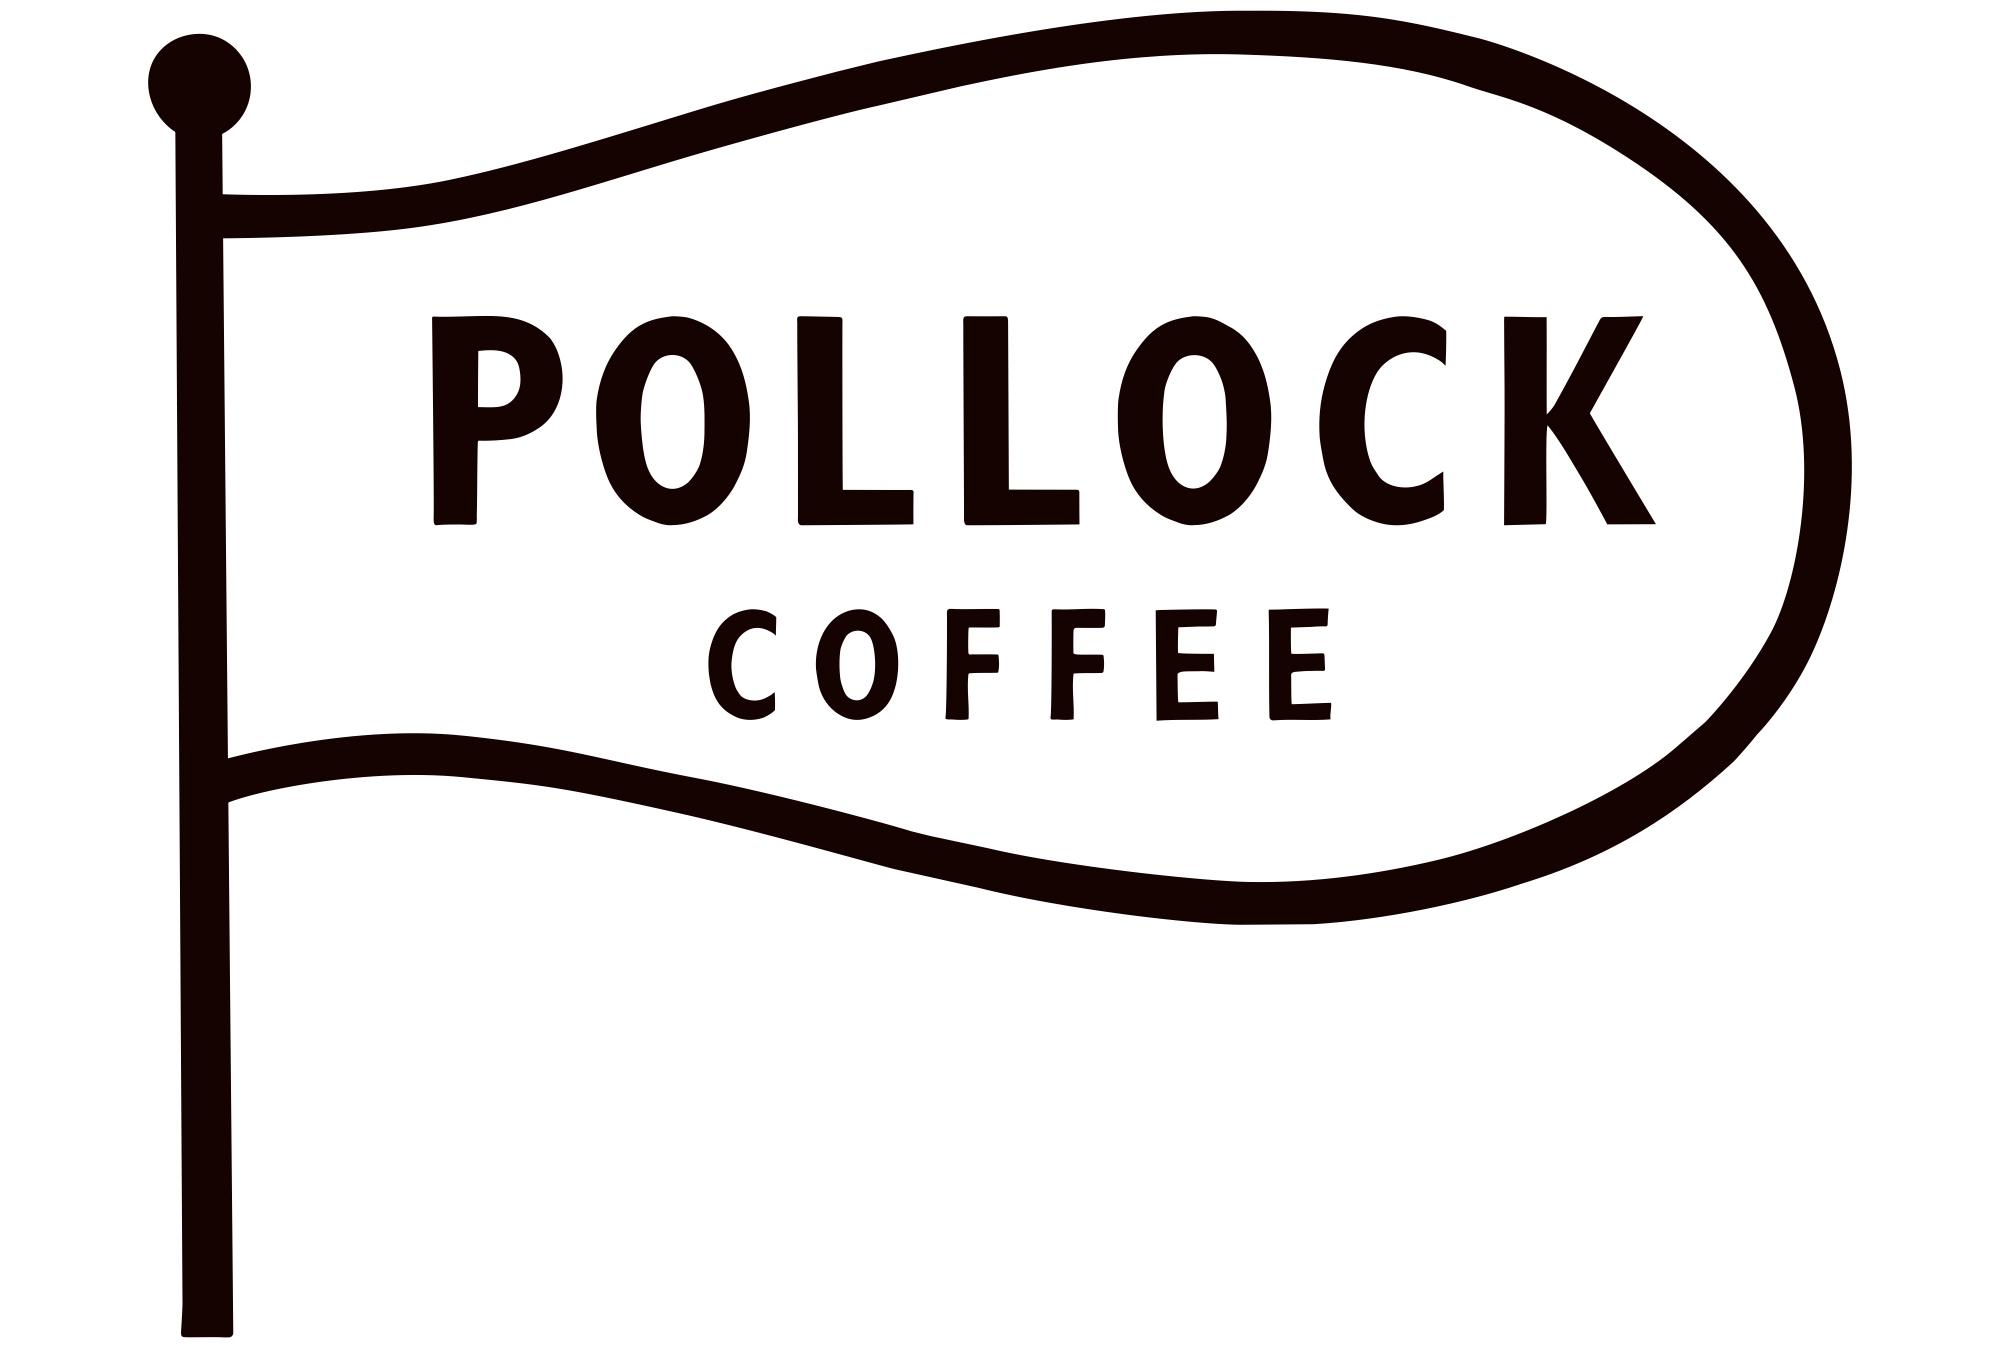 POLLOCK COFFEE